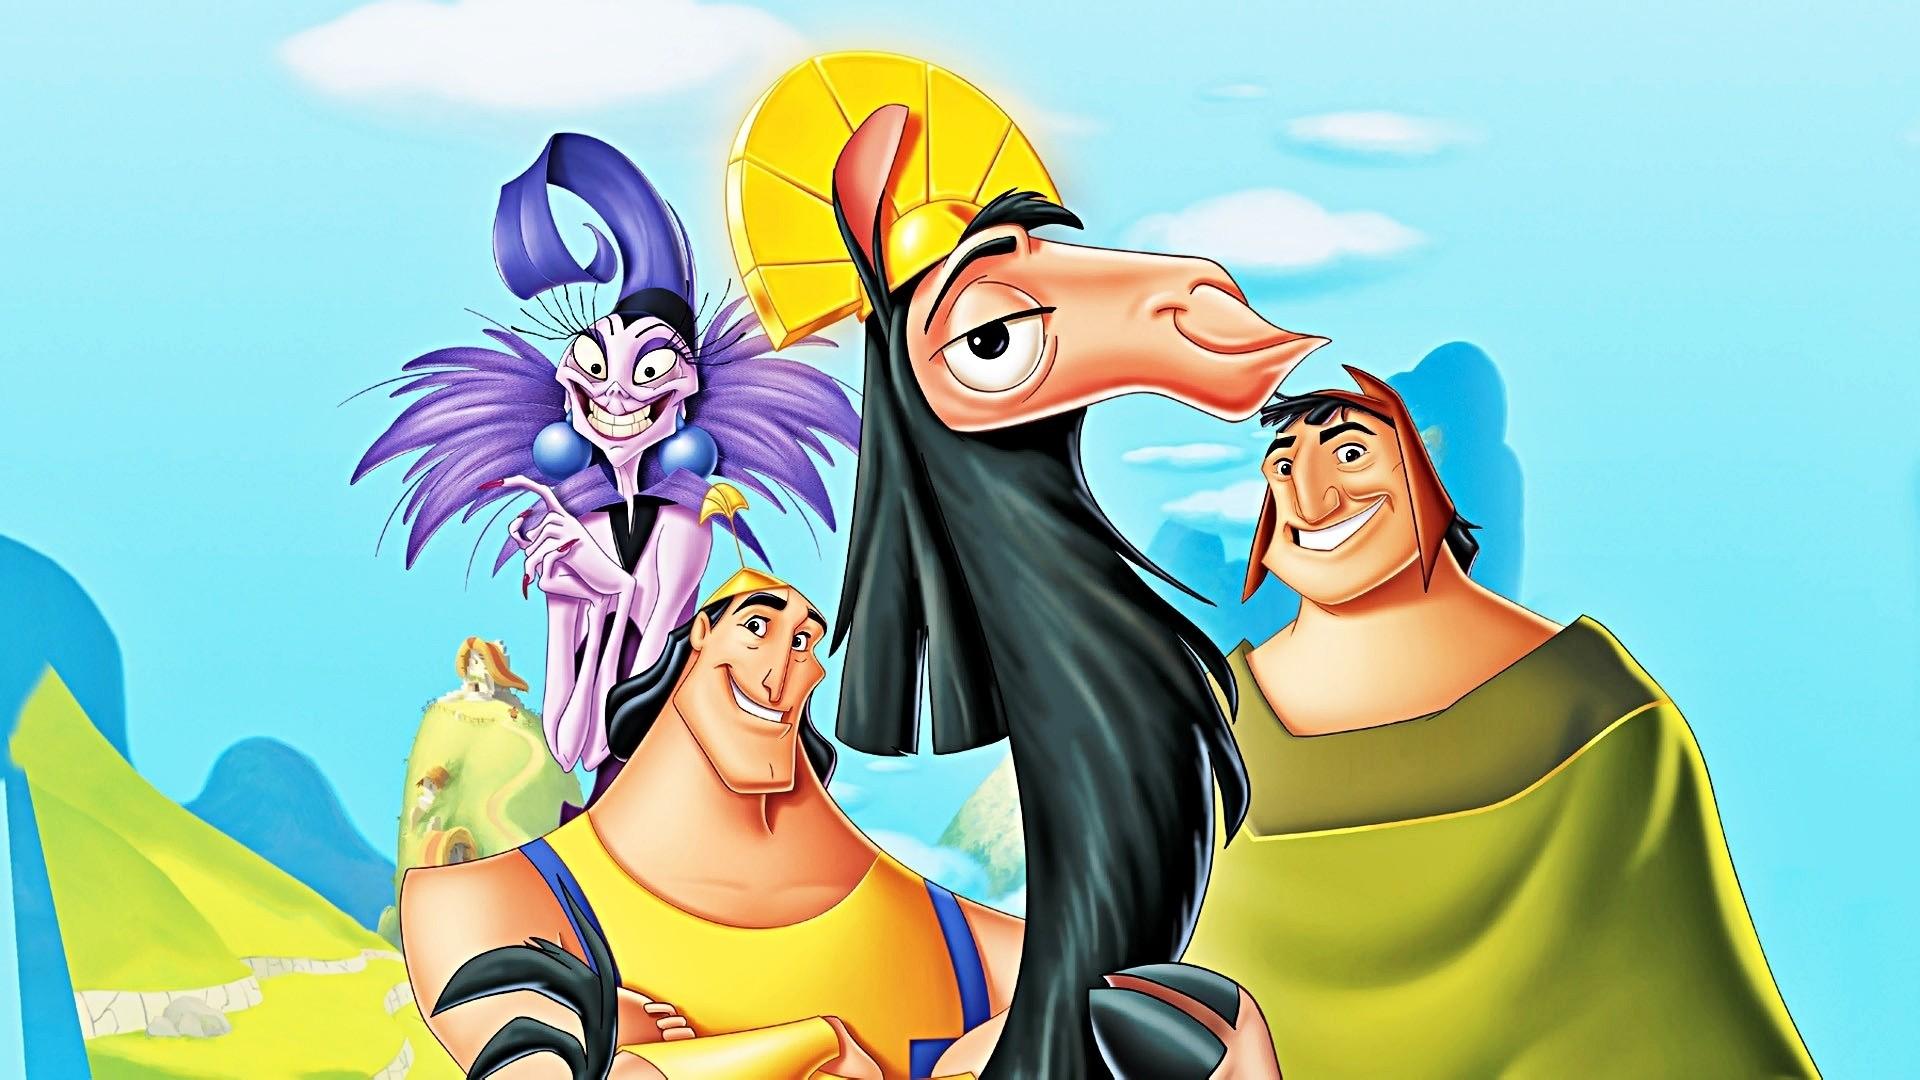 Res: 1920x1080, 1920x1440 Disney Cartoon Characters HD Wallpapers